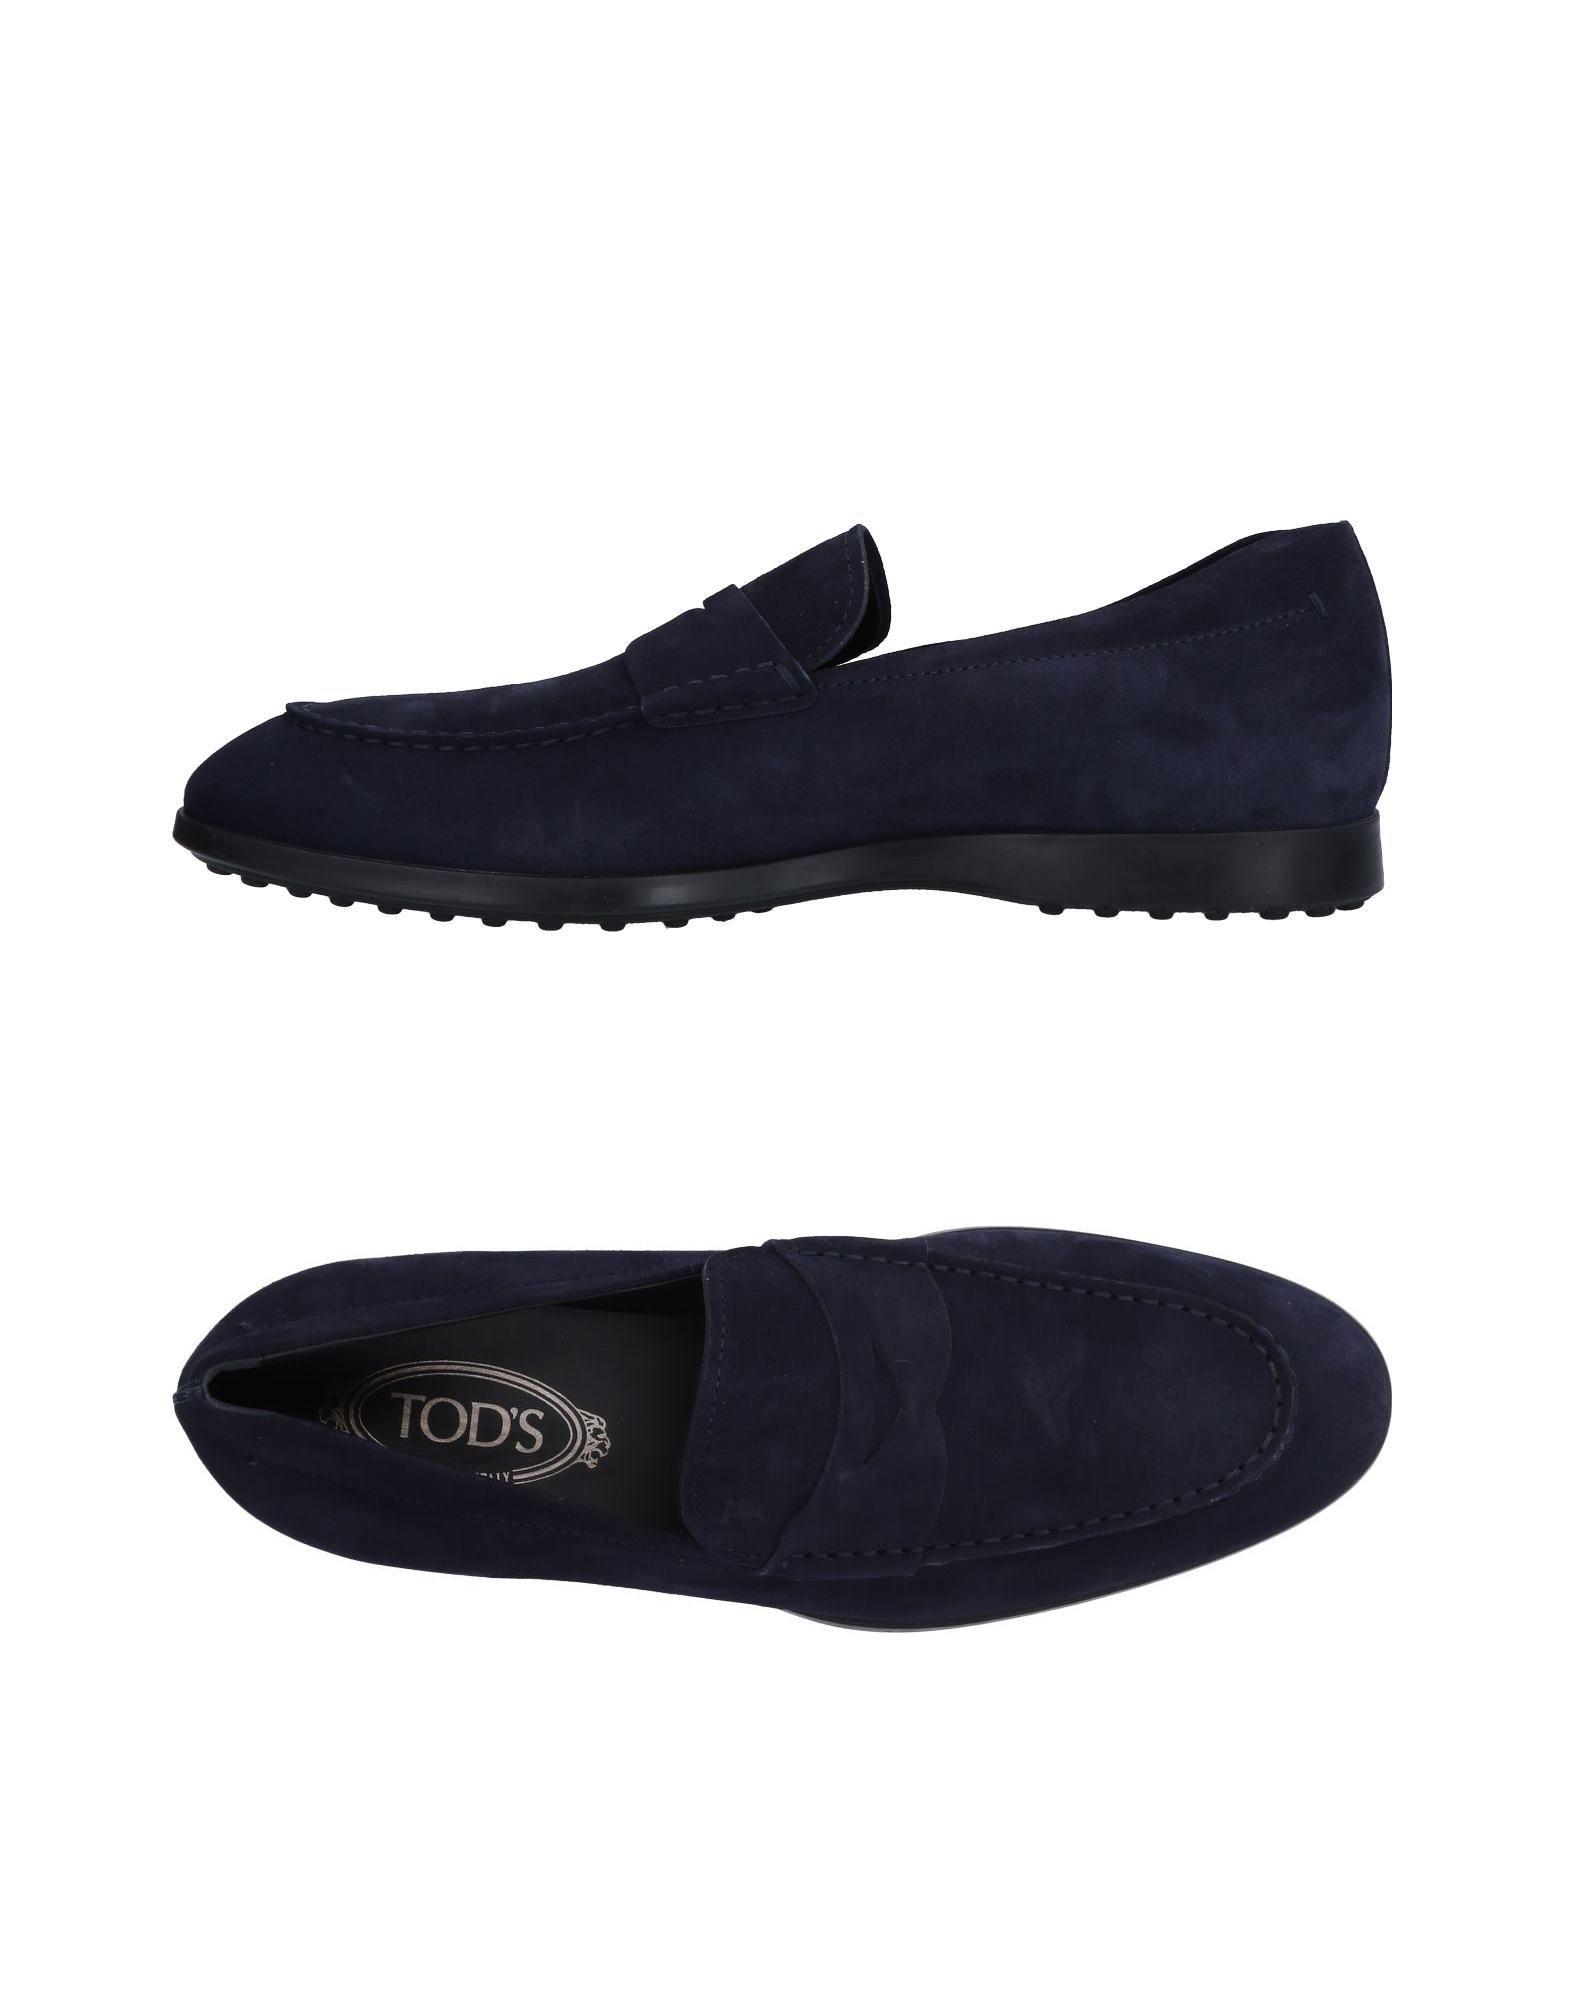 Tod's Mokassins Herren  11516984UG Gute Qualität beliebte Schuhe